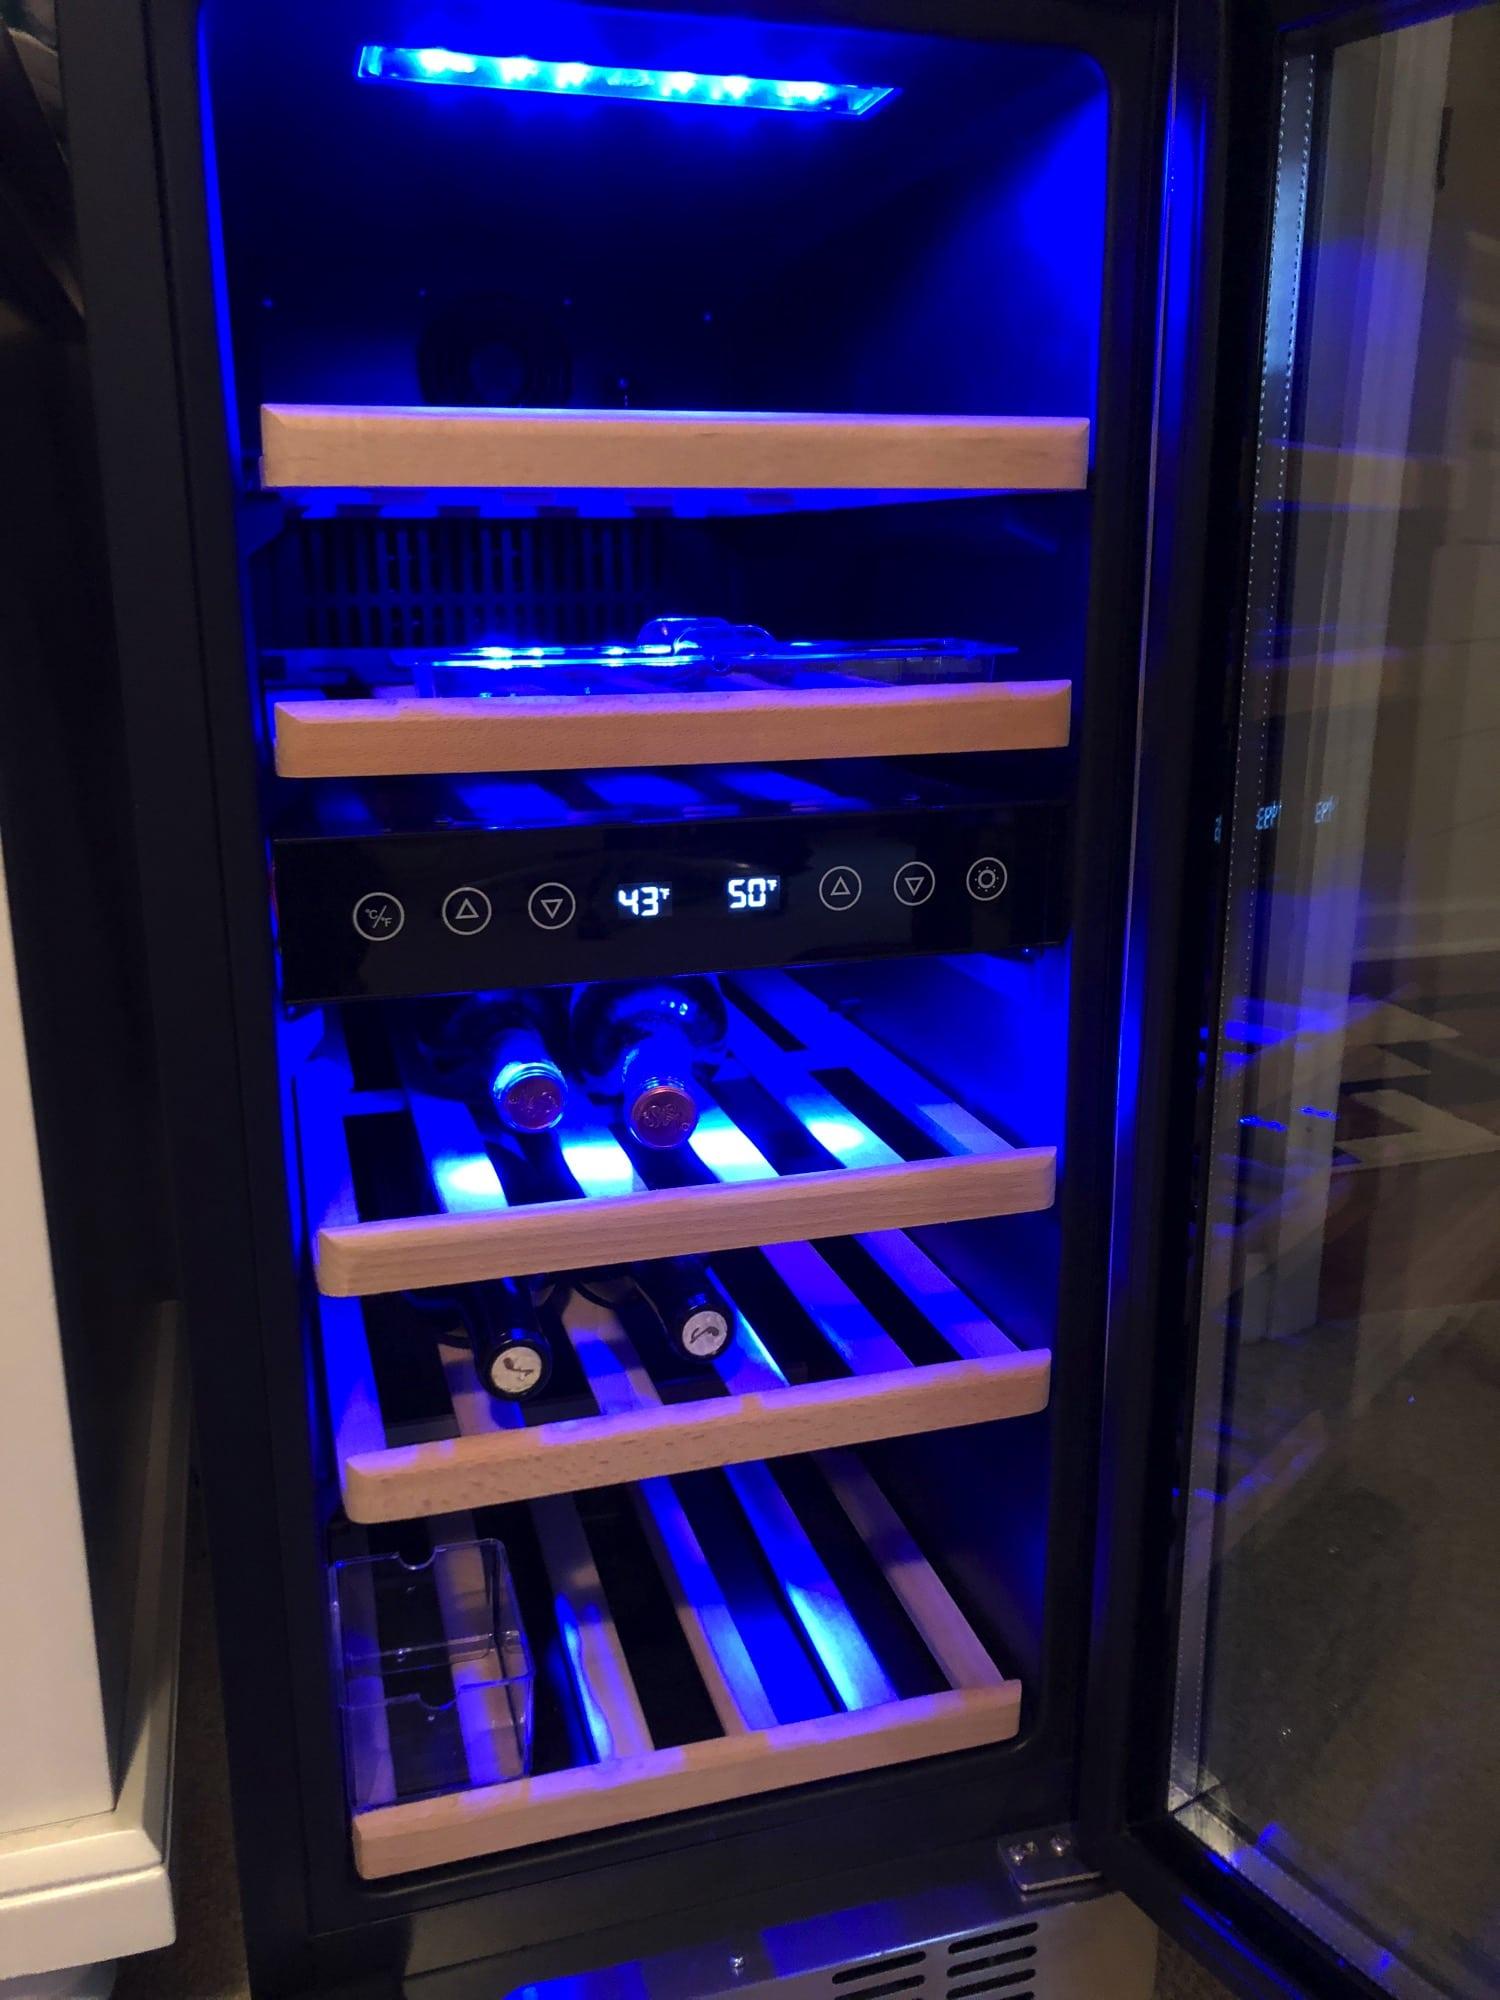 NewAir AWR-290DB Compressor Wine Cooler